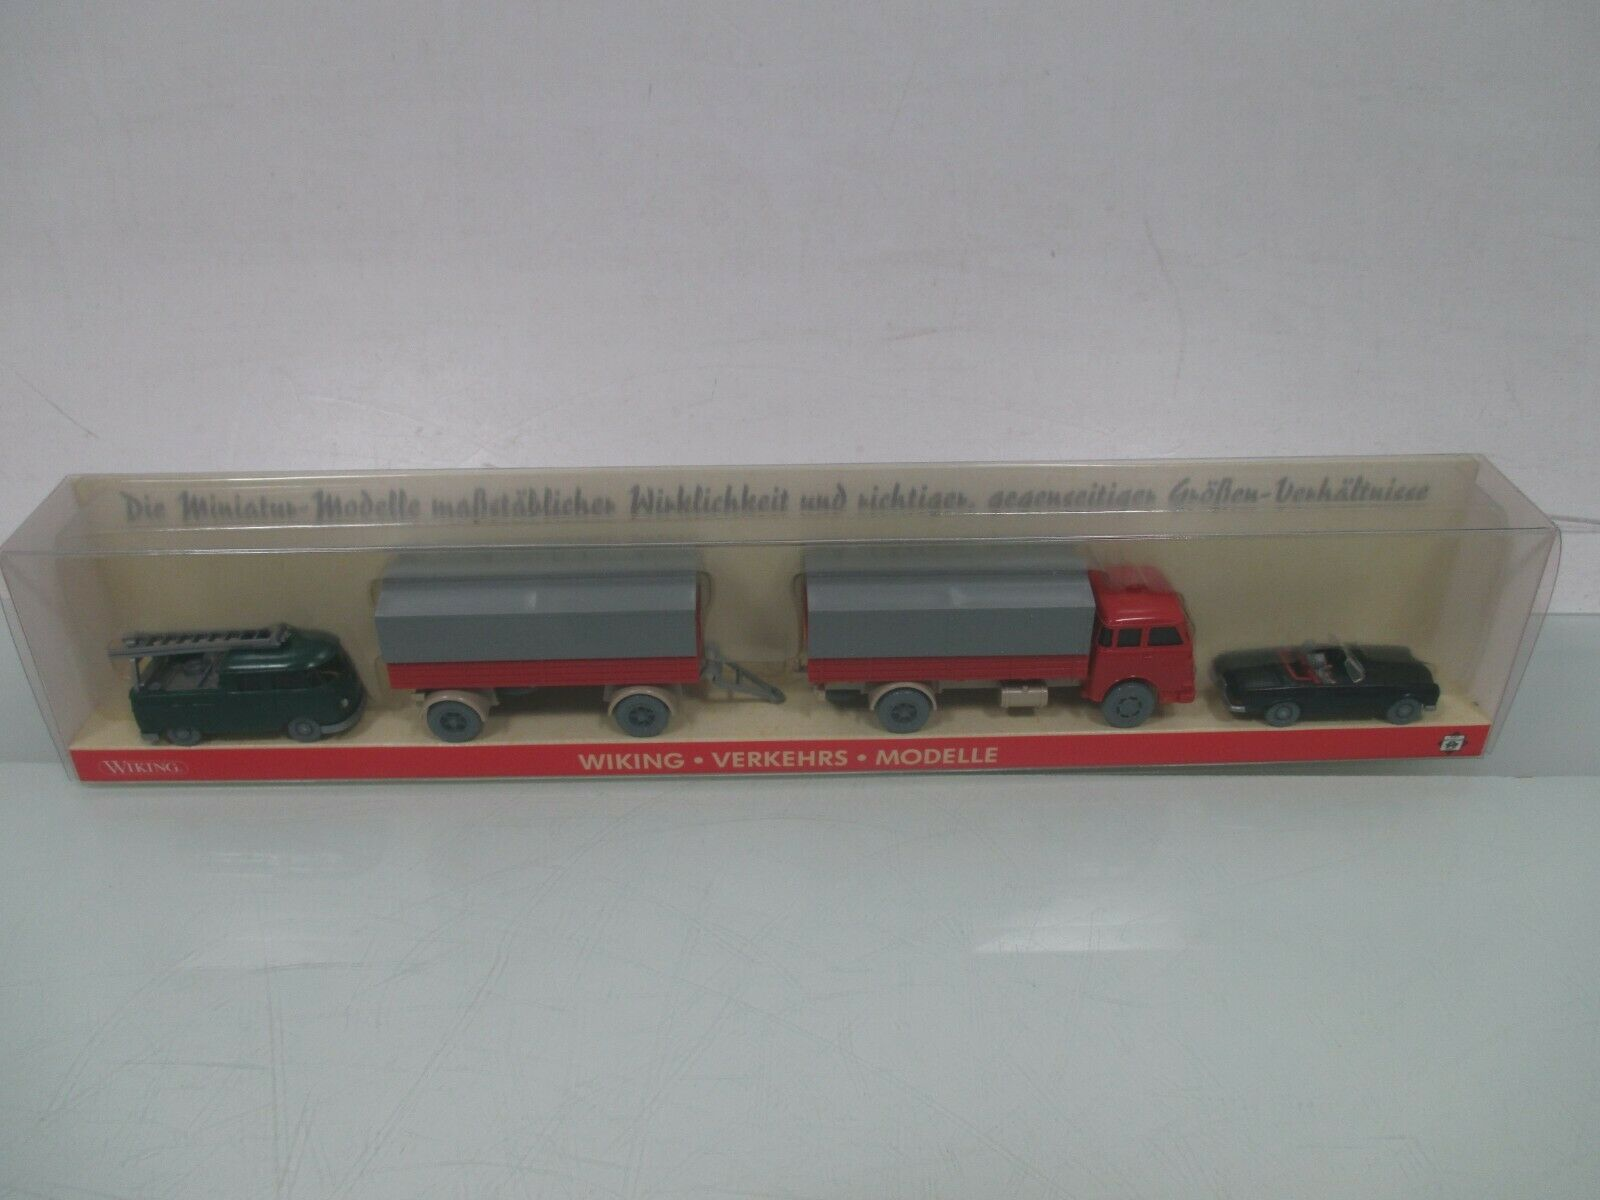 Wiking 1 87 pms-189065 Wiking. transporte. los modelos de salida nº 23 embalaje original (wm5592)